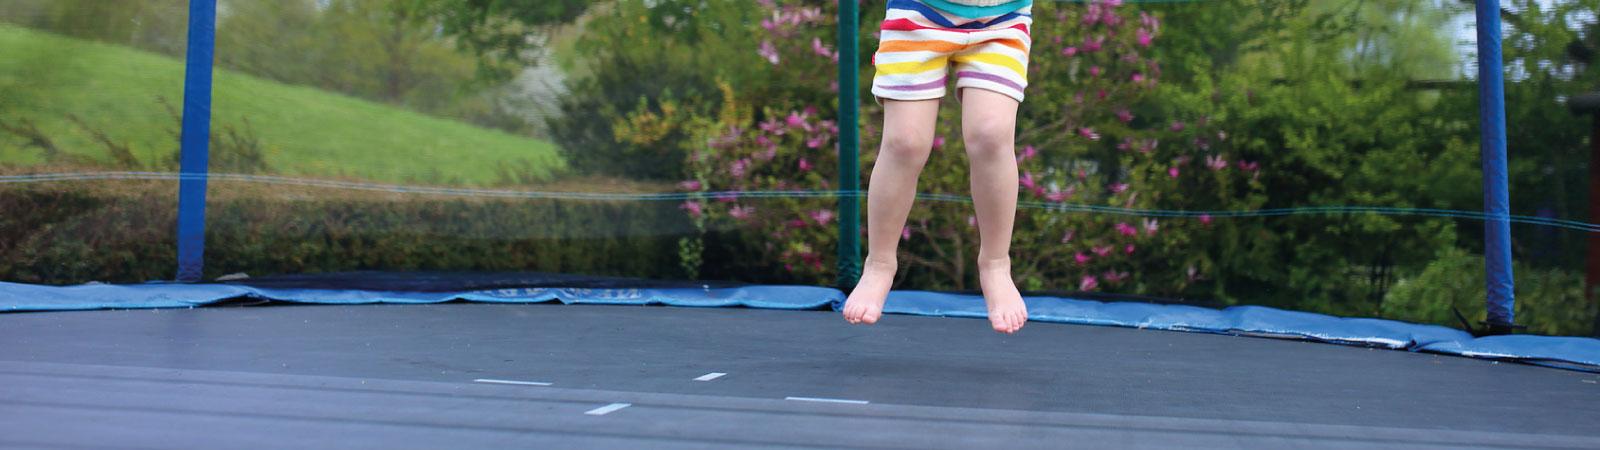 trampoline-flatpack-assembly-service